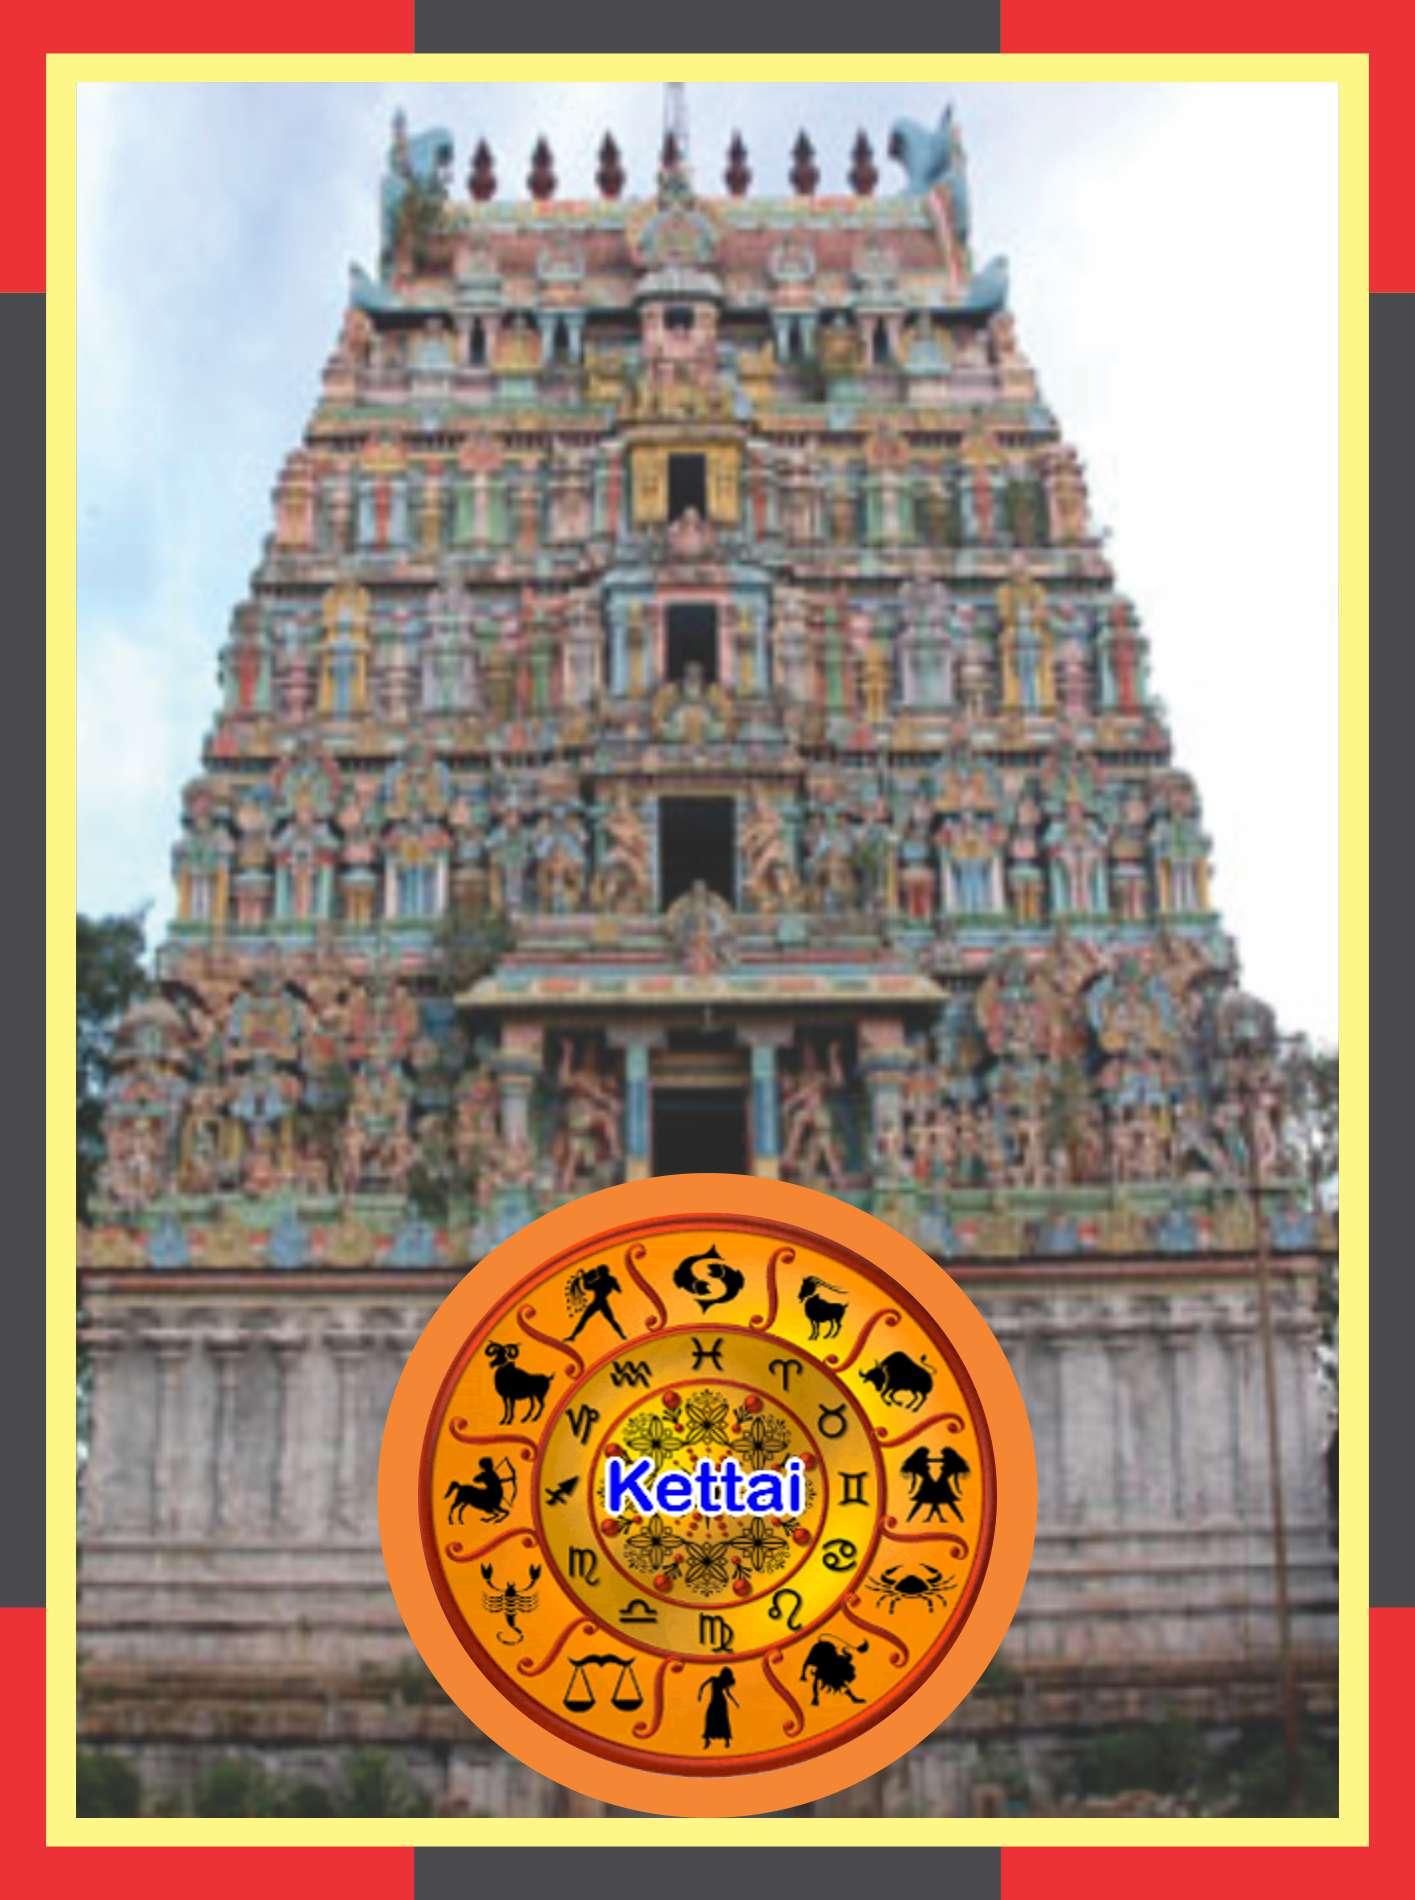 Vazhyvoor– Veeratteswarar Temple Spl Parihara Puja for Kettai Star